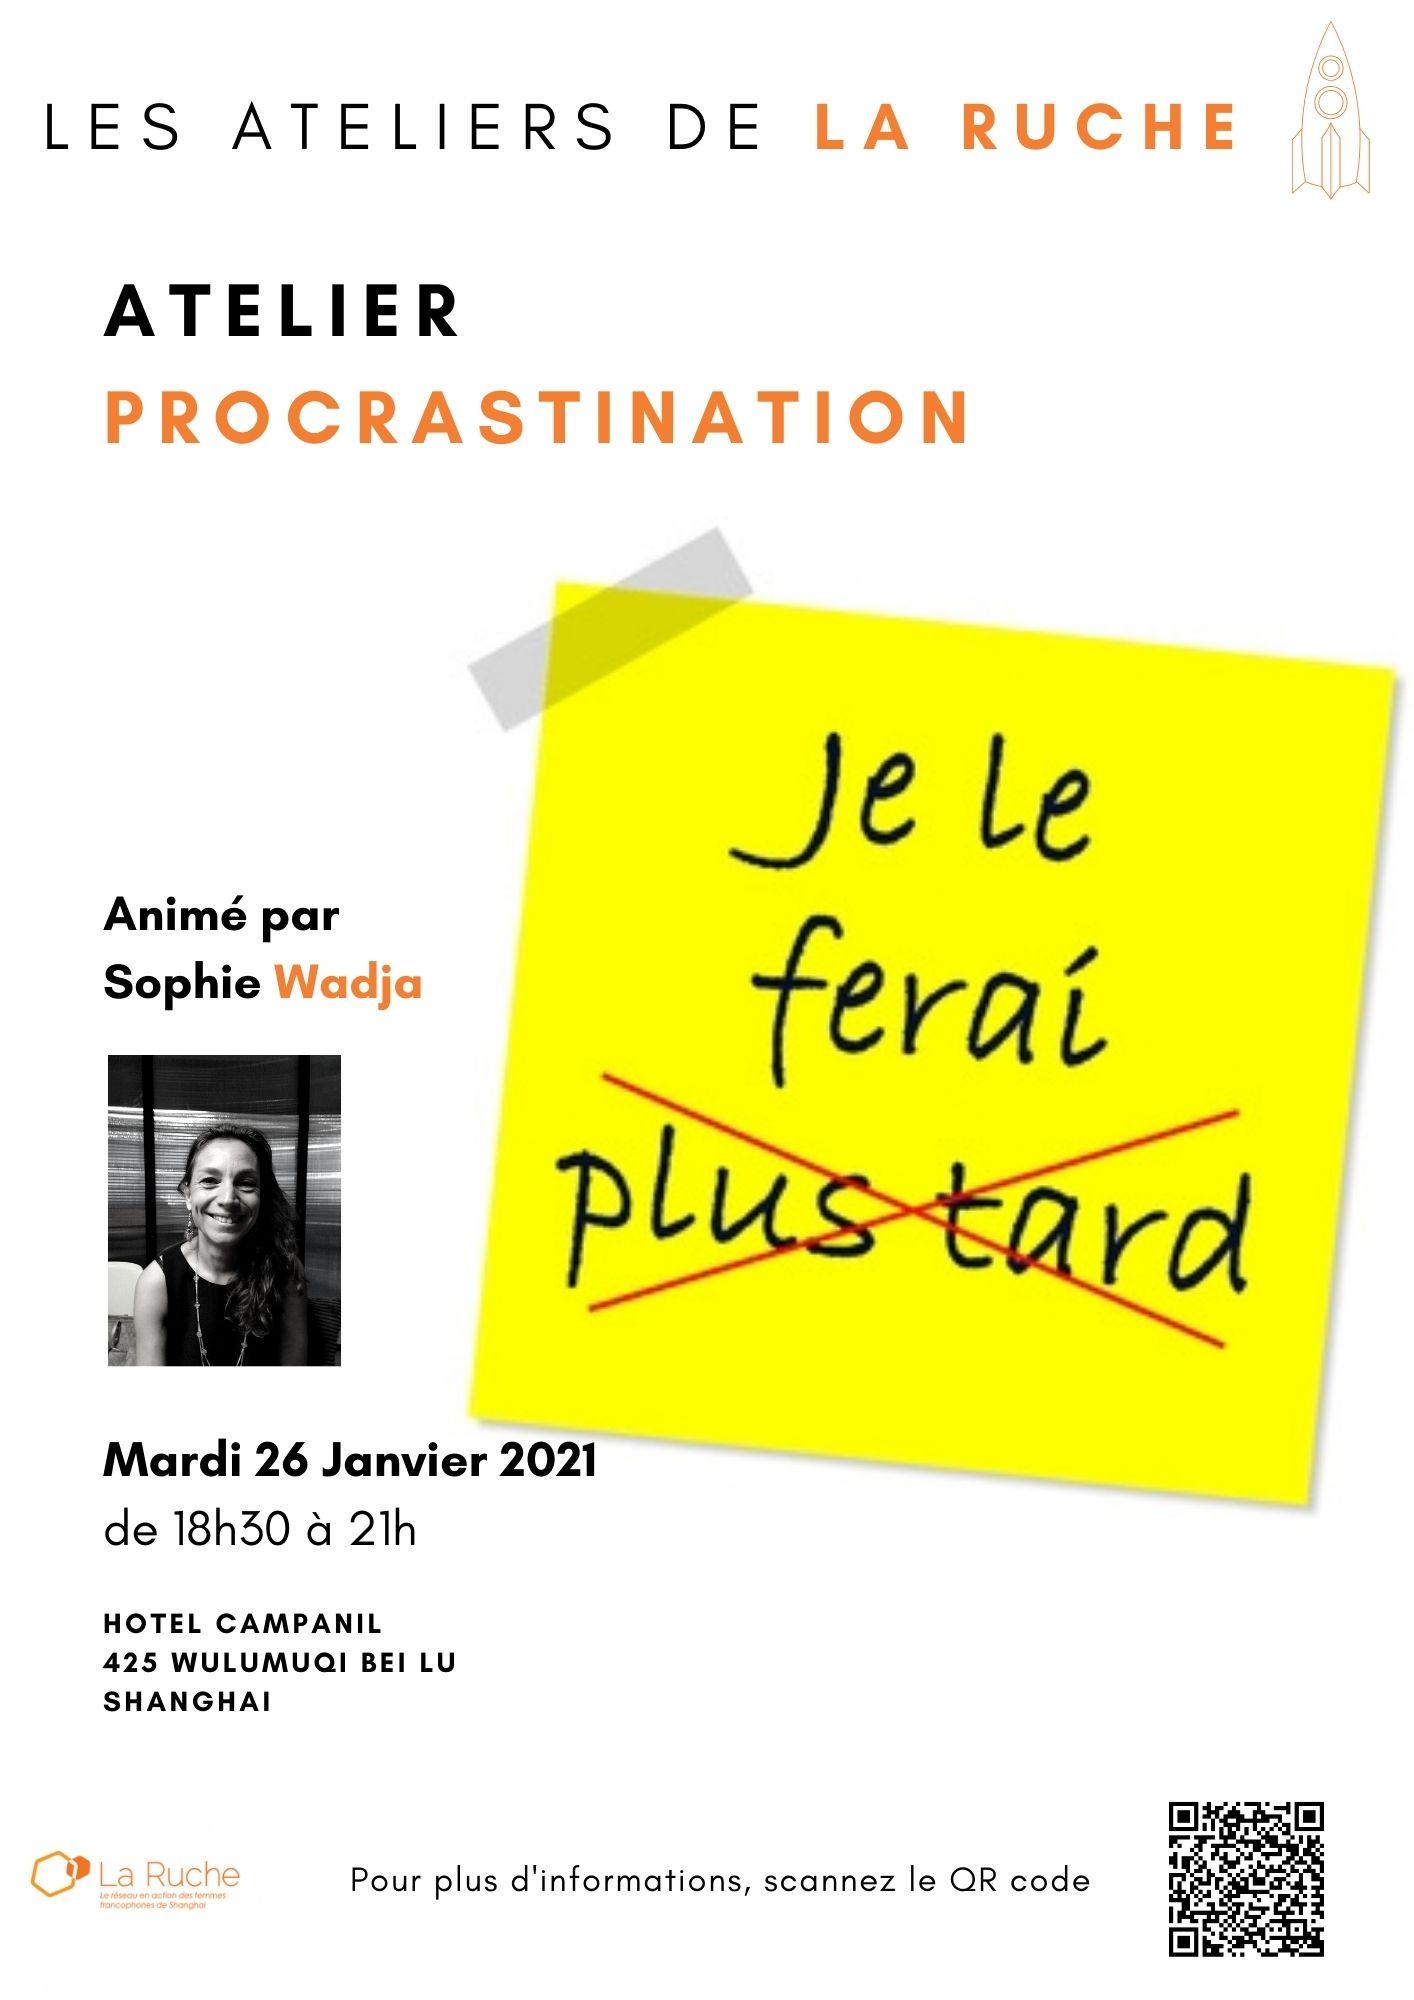 Mardi 26 Janvier - Atelier Procrastination